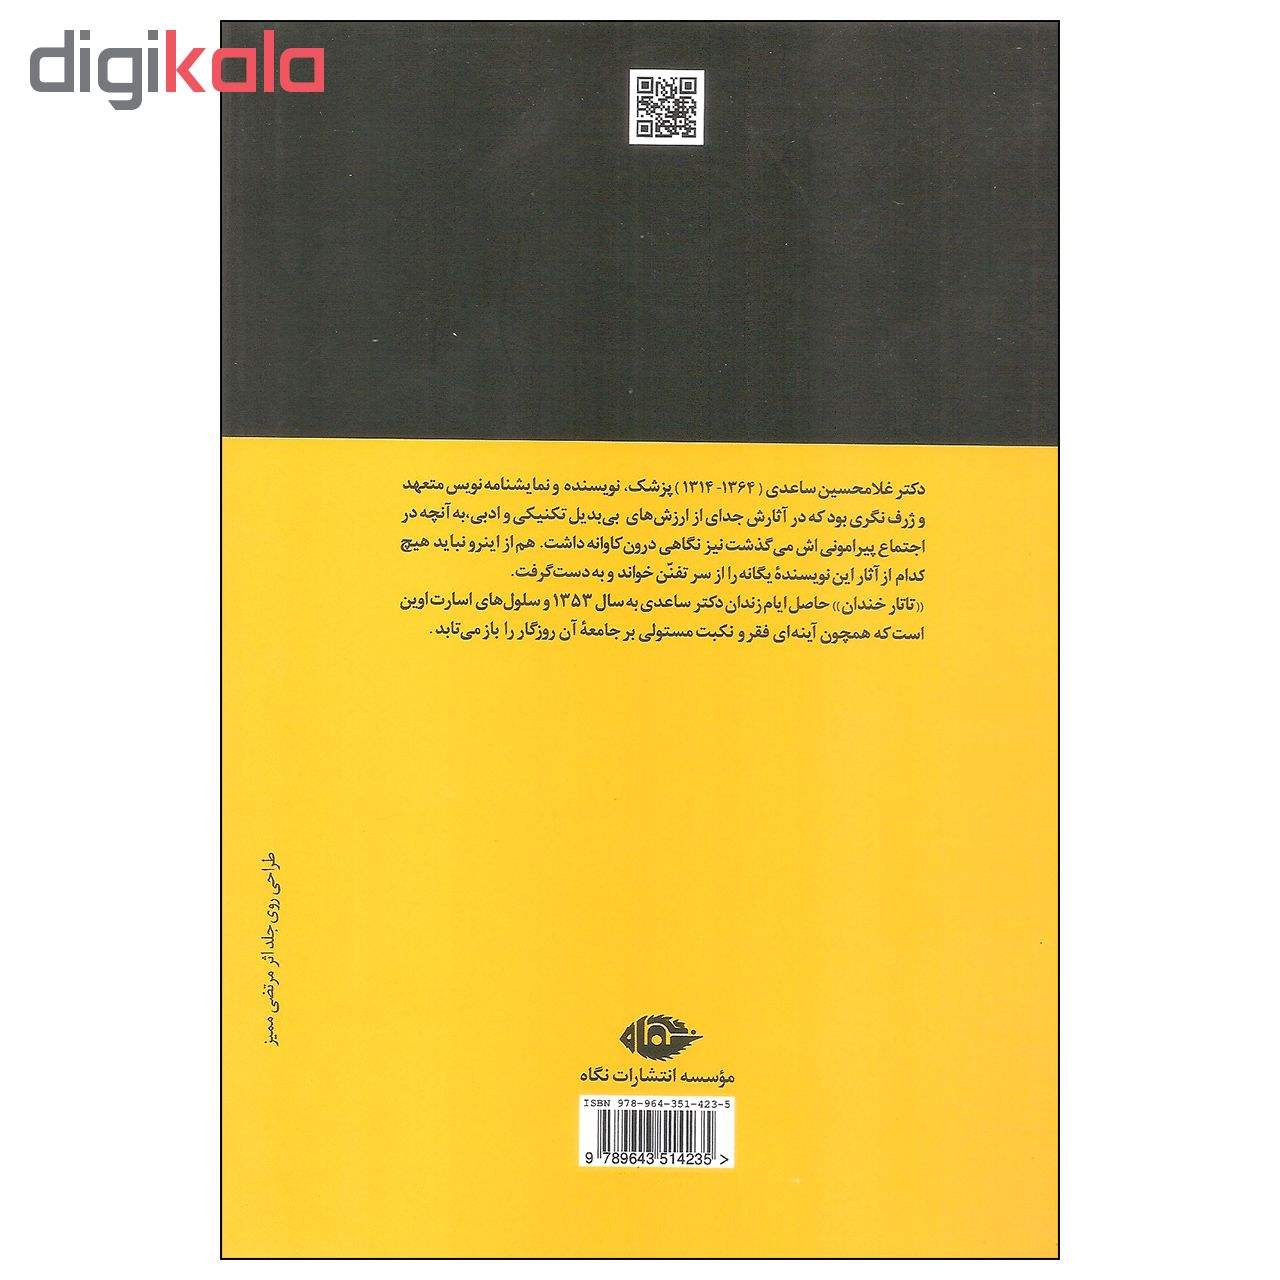 کتاب تاتار خندان اثر غلامحسین ساعدی نشر نگاه main 1 2